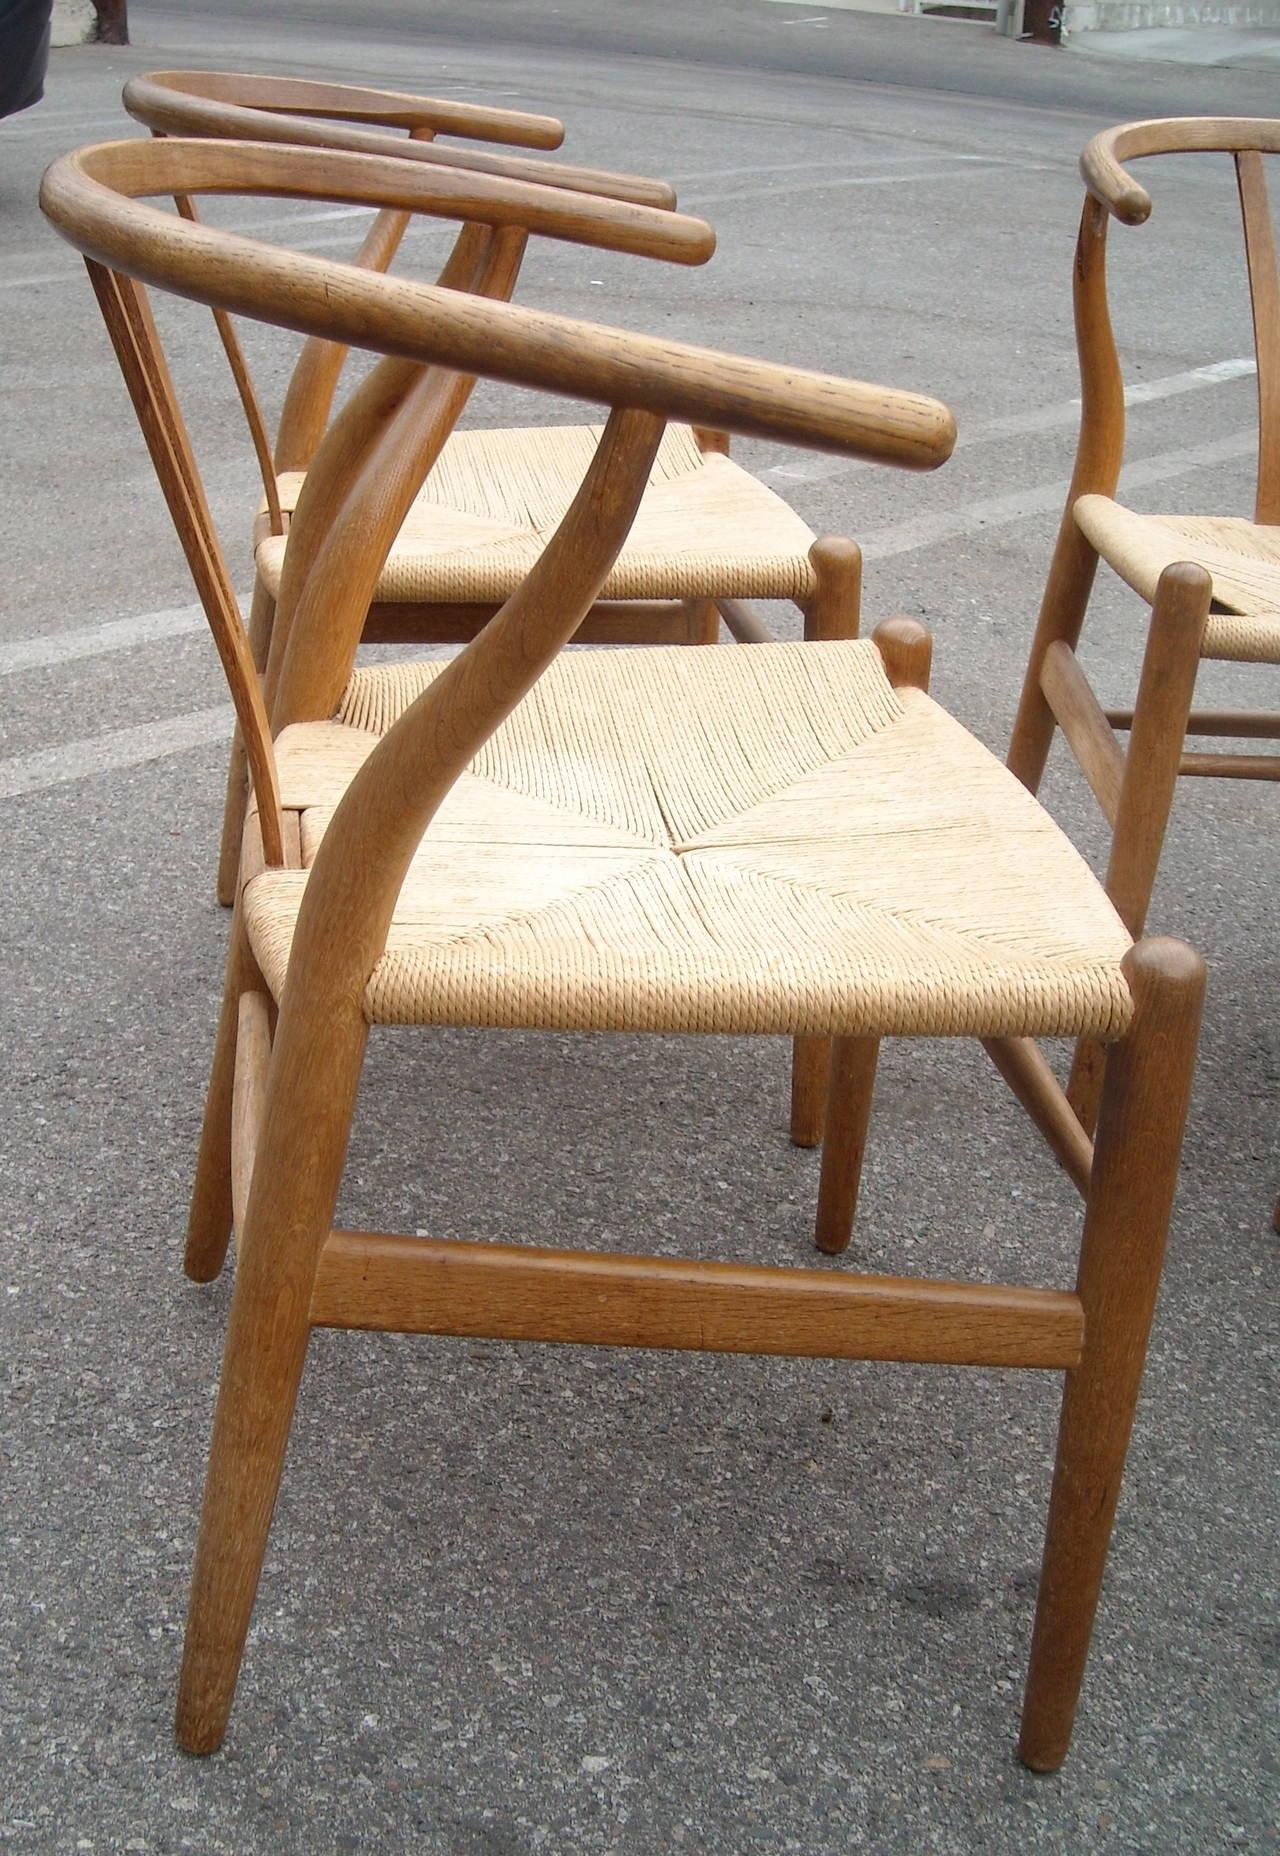 hans wegner ch 24 original set of two o wishbone chair y for carl hansen denmar at 1stdibs. Black Bedroom Furniture Sets. Home Design Ideas